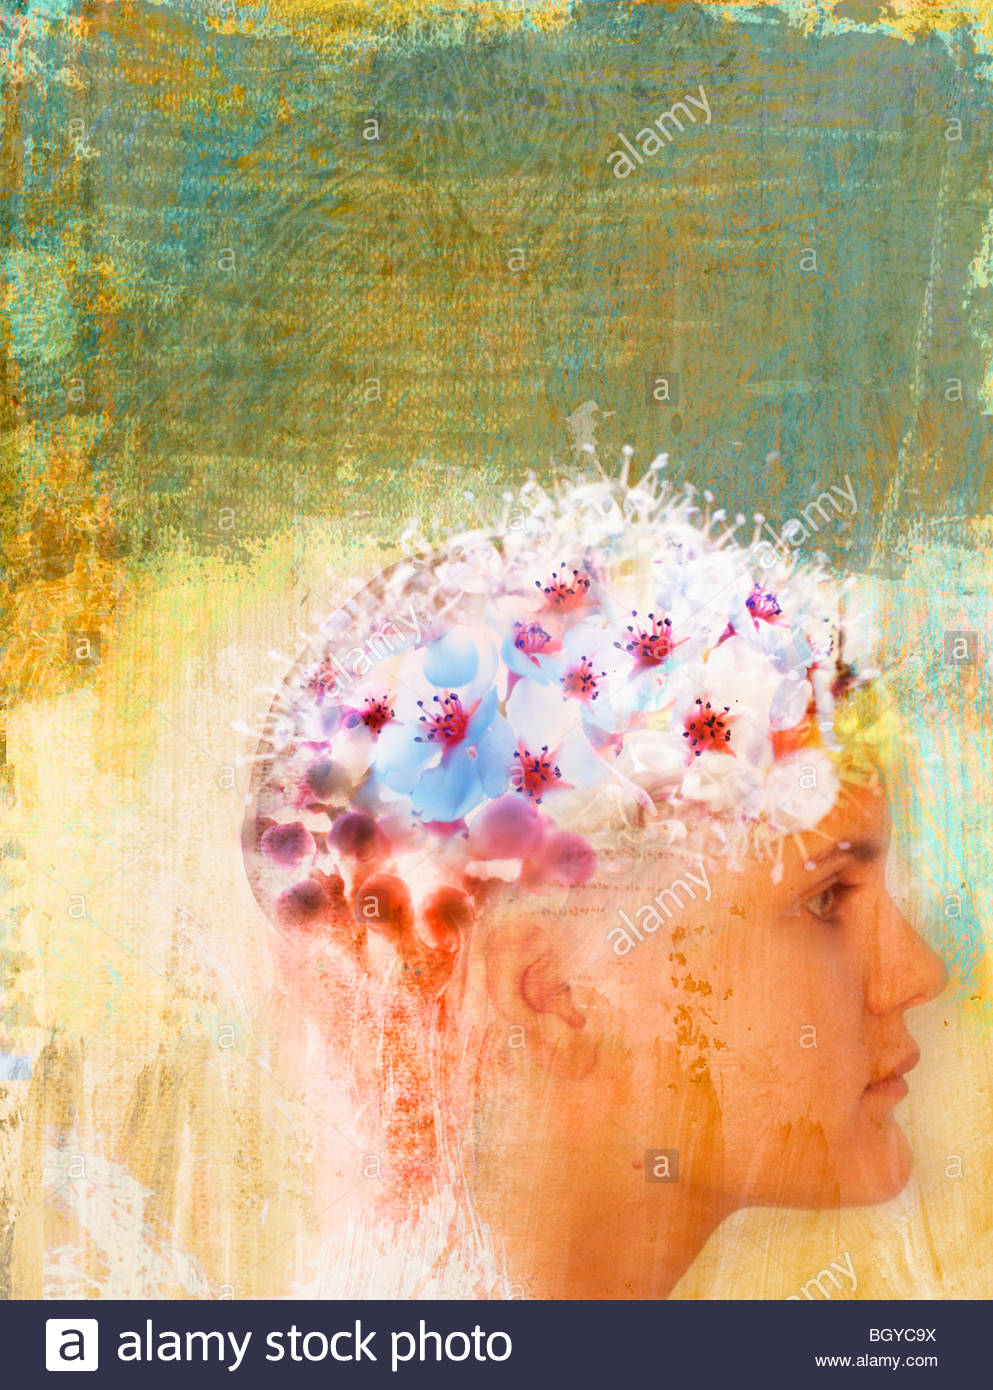 Frau mit Blumen auf Kopf Stockfoto